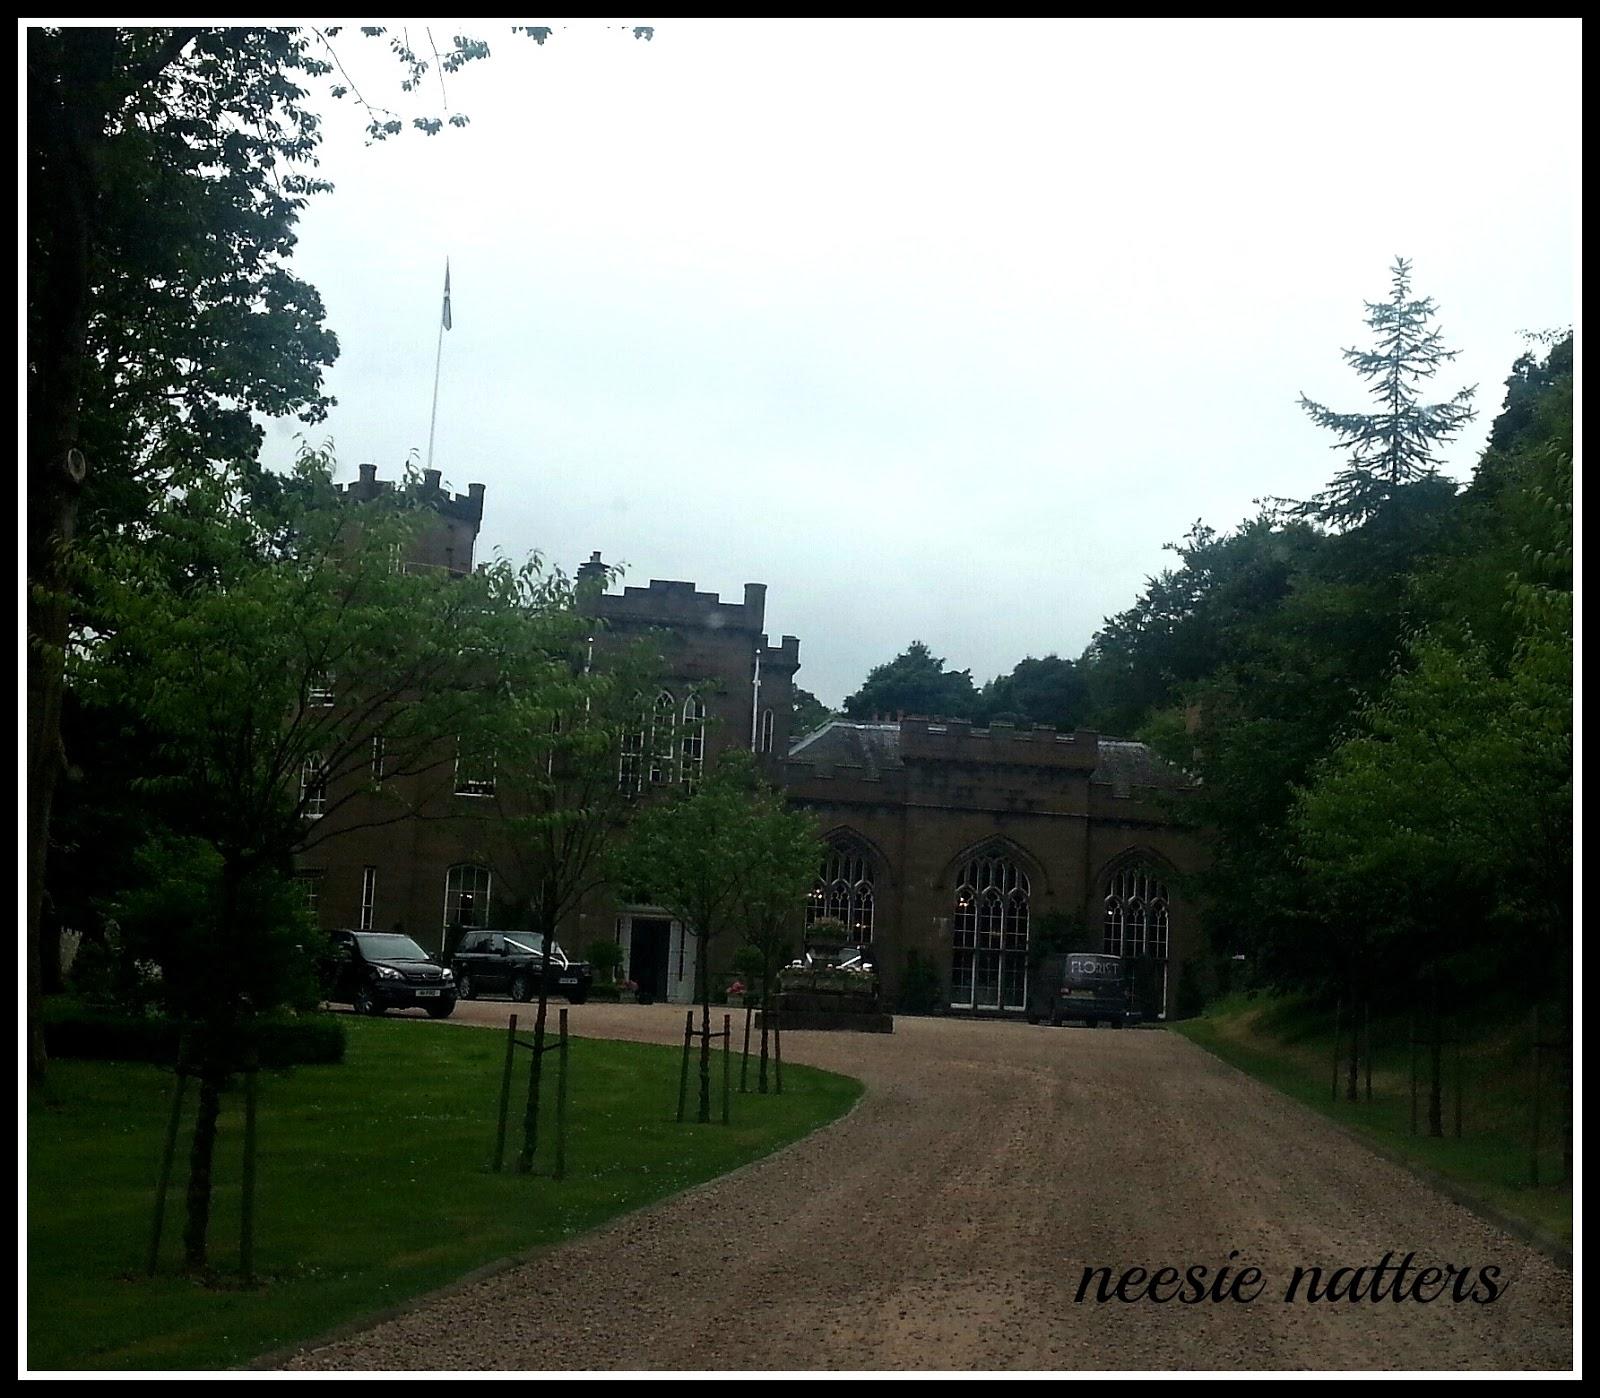 Neesie Natters: Fairy Tale Wedding at Drumtochty Castle (Part 2)